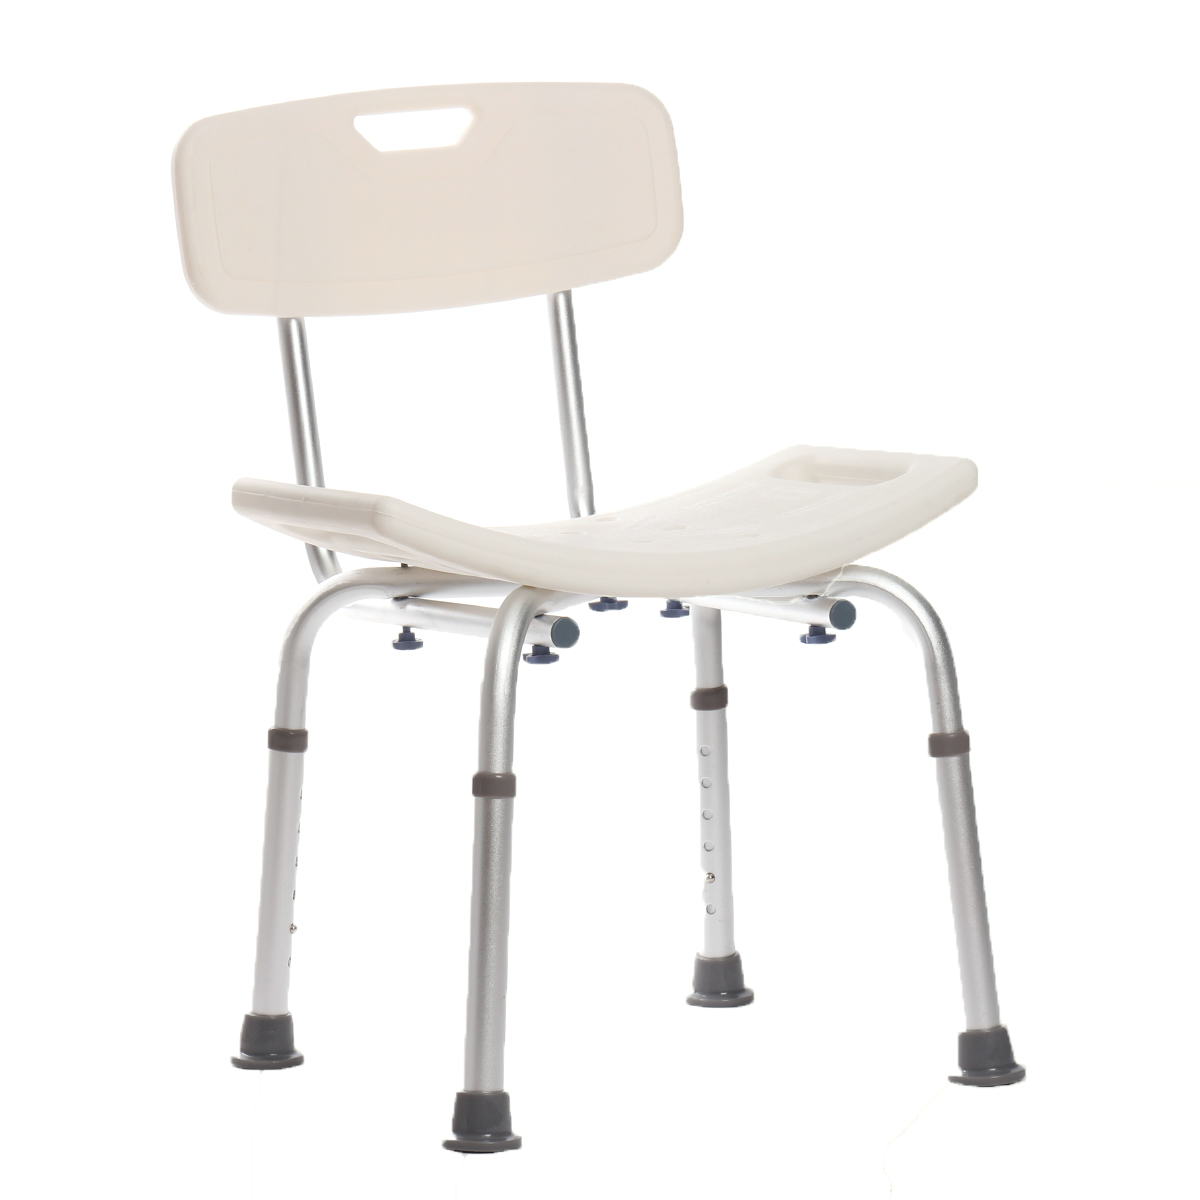 Aluminium Bath Shower Seat Stool Chair Adjustable Height Mobility ...